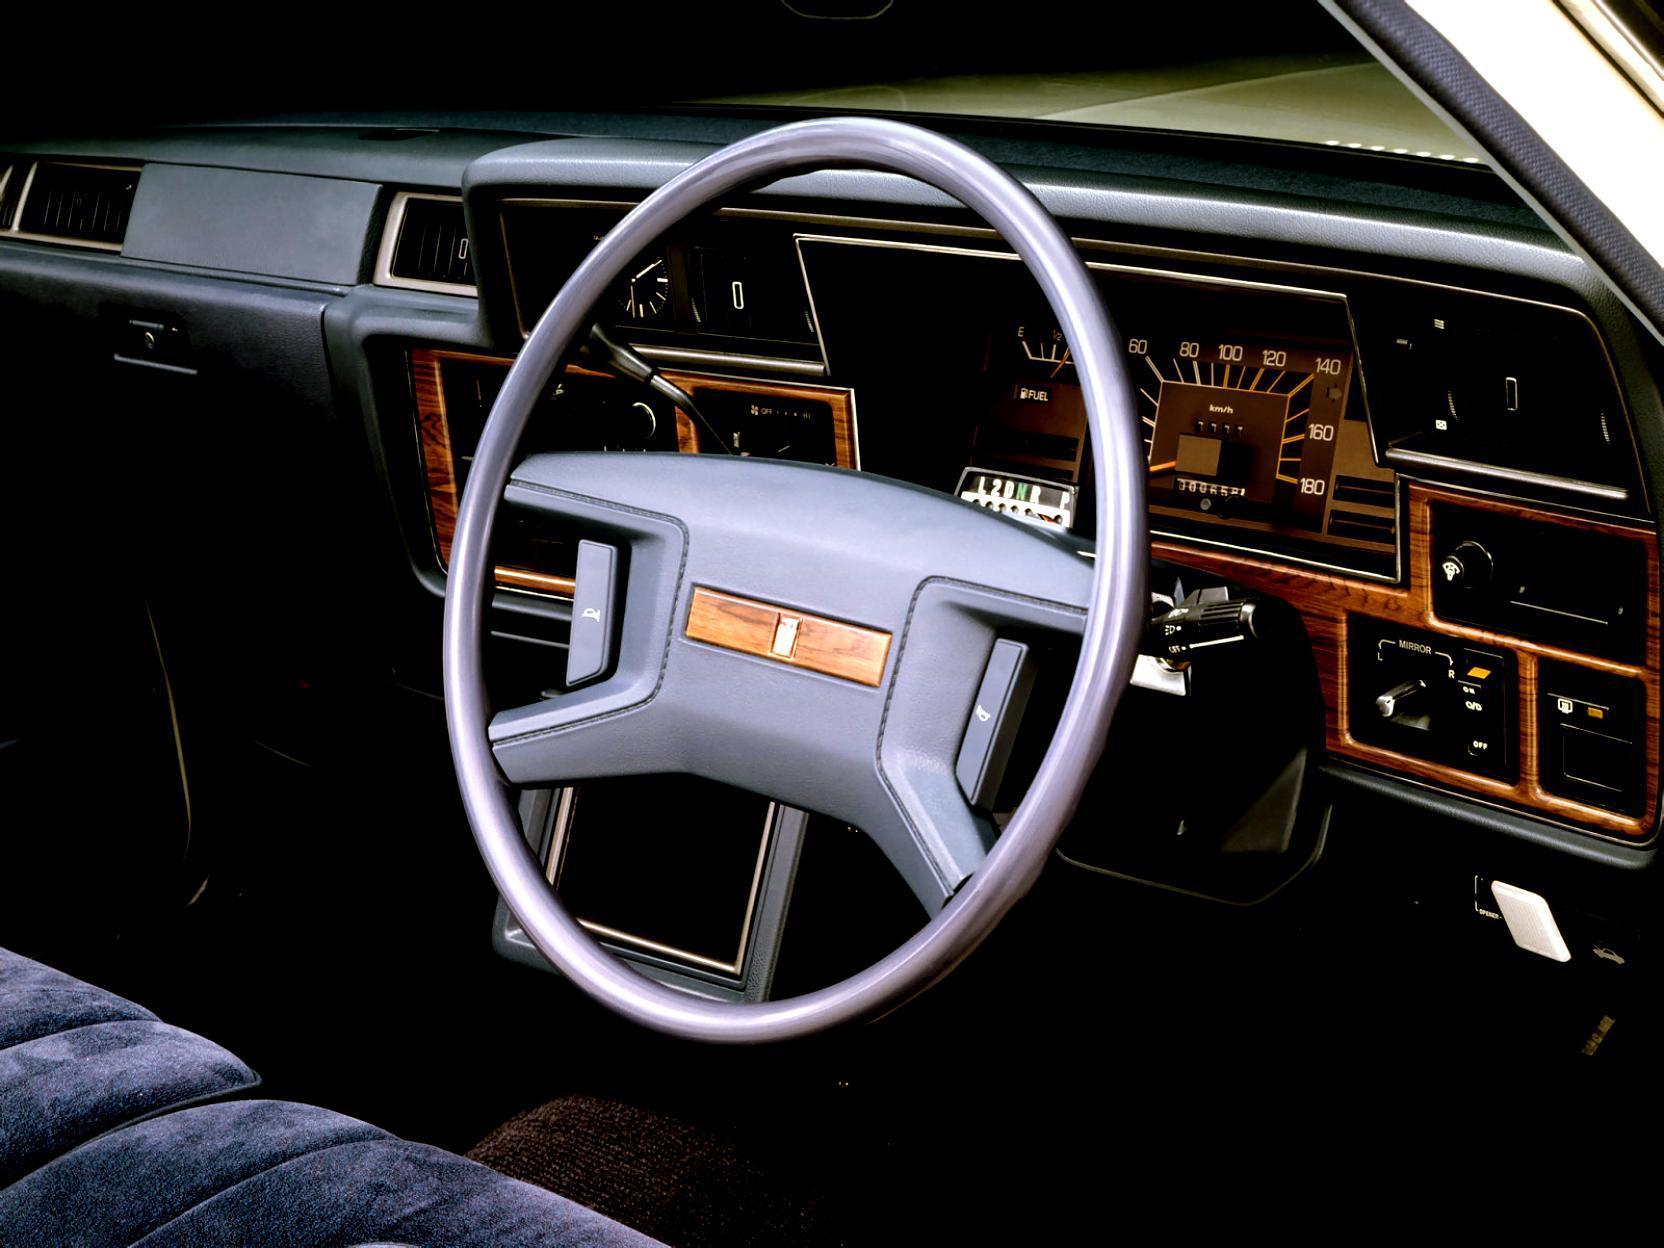 Honda Odyssey 2010, Здравствуйте, кузов RB-4, автомат, 4WD ...